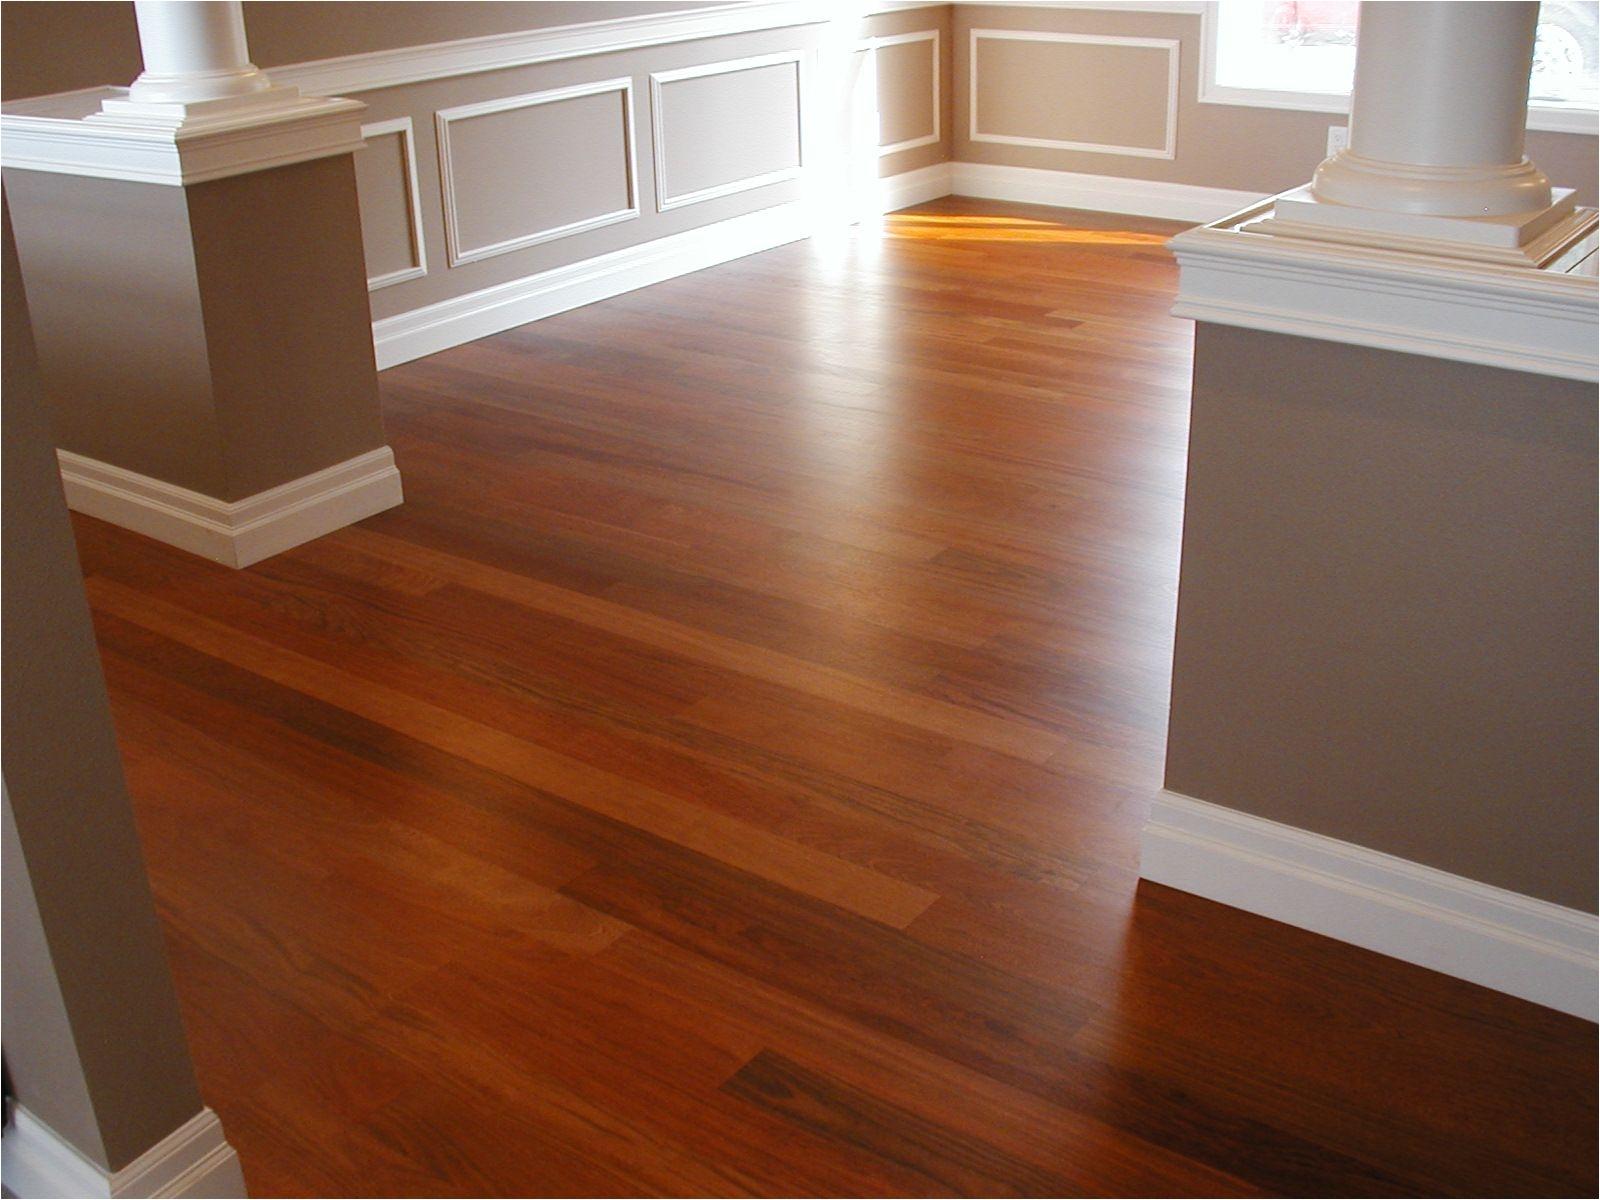 brazilian cherry floors in kitchen help choosing harwood floor color laminate hardwood cabinet colors